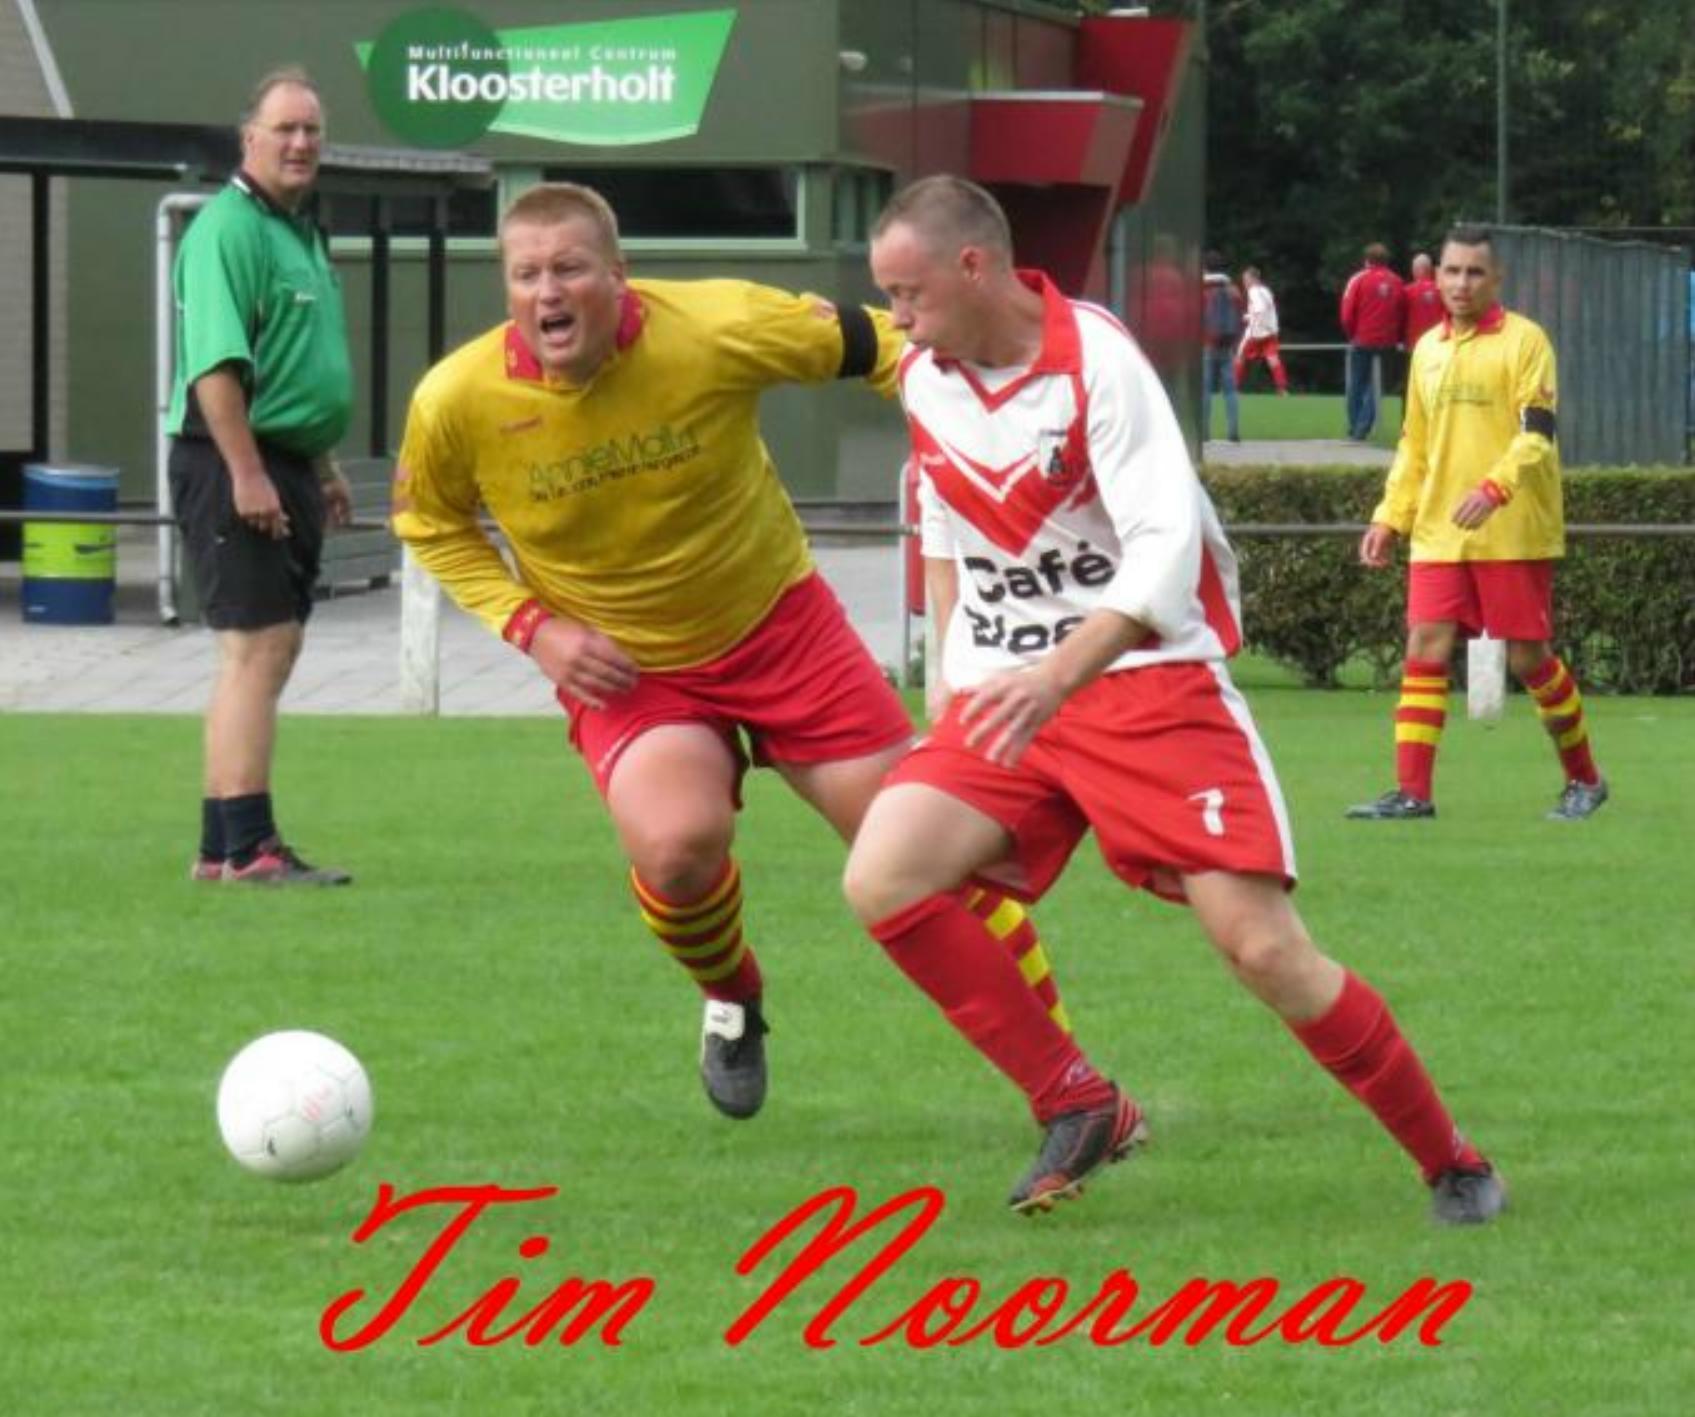 Tim-Noorman